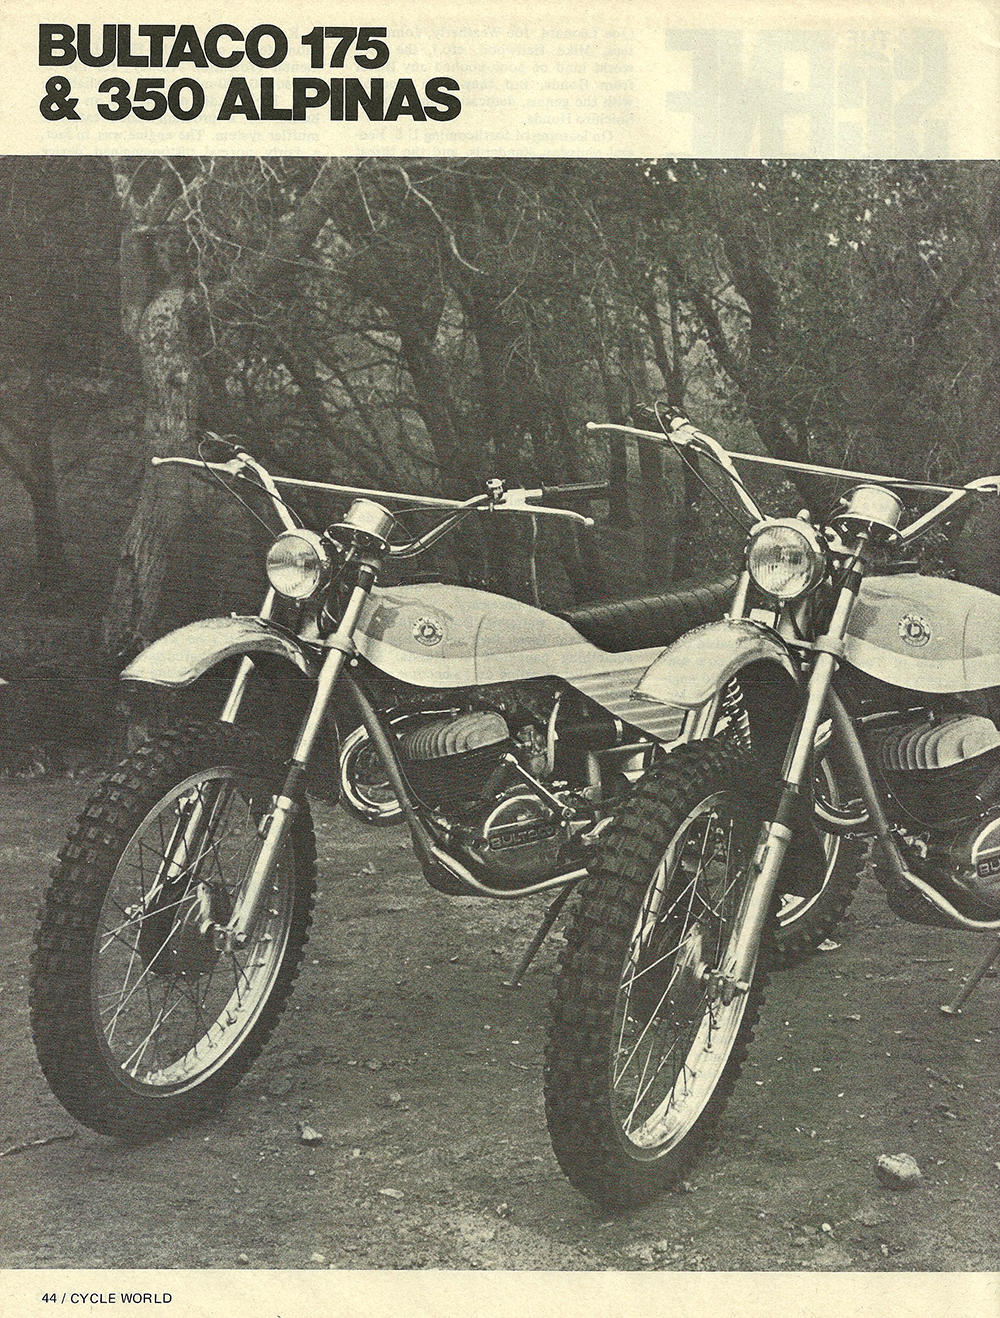 1973 Bultaco Alpina 175 350 road test 01.jpg